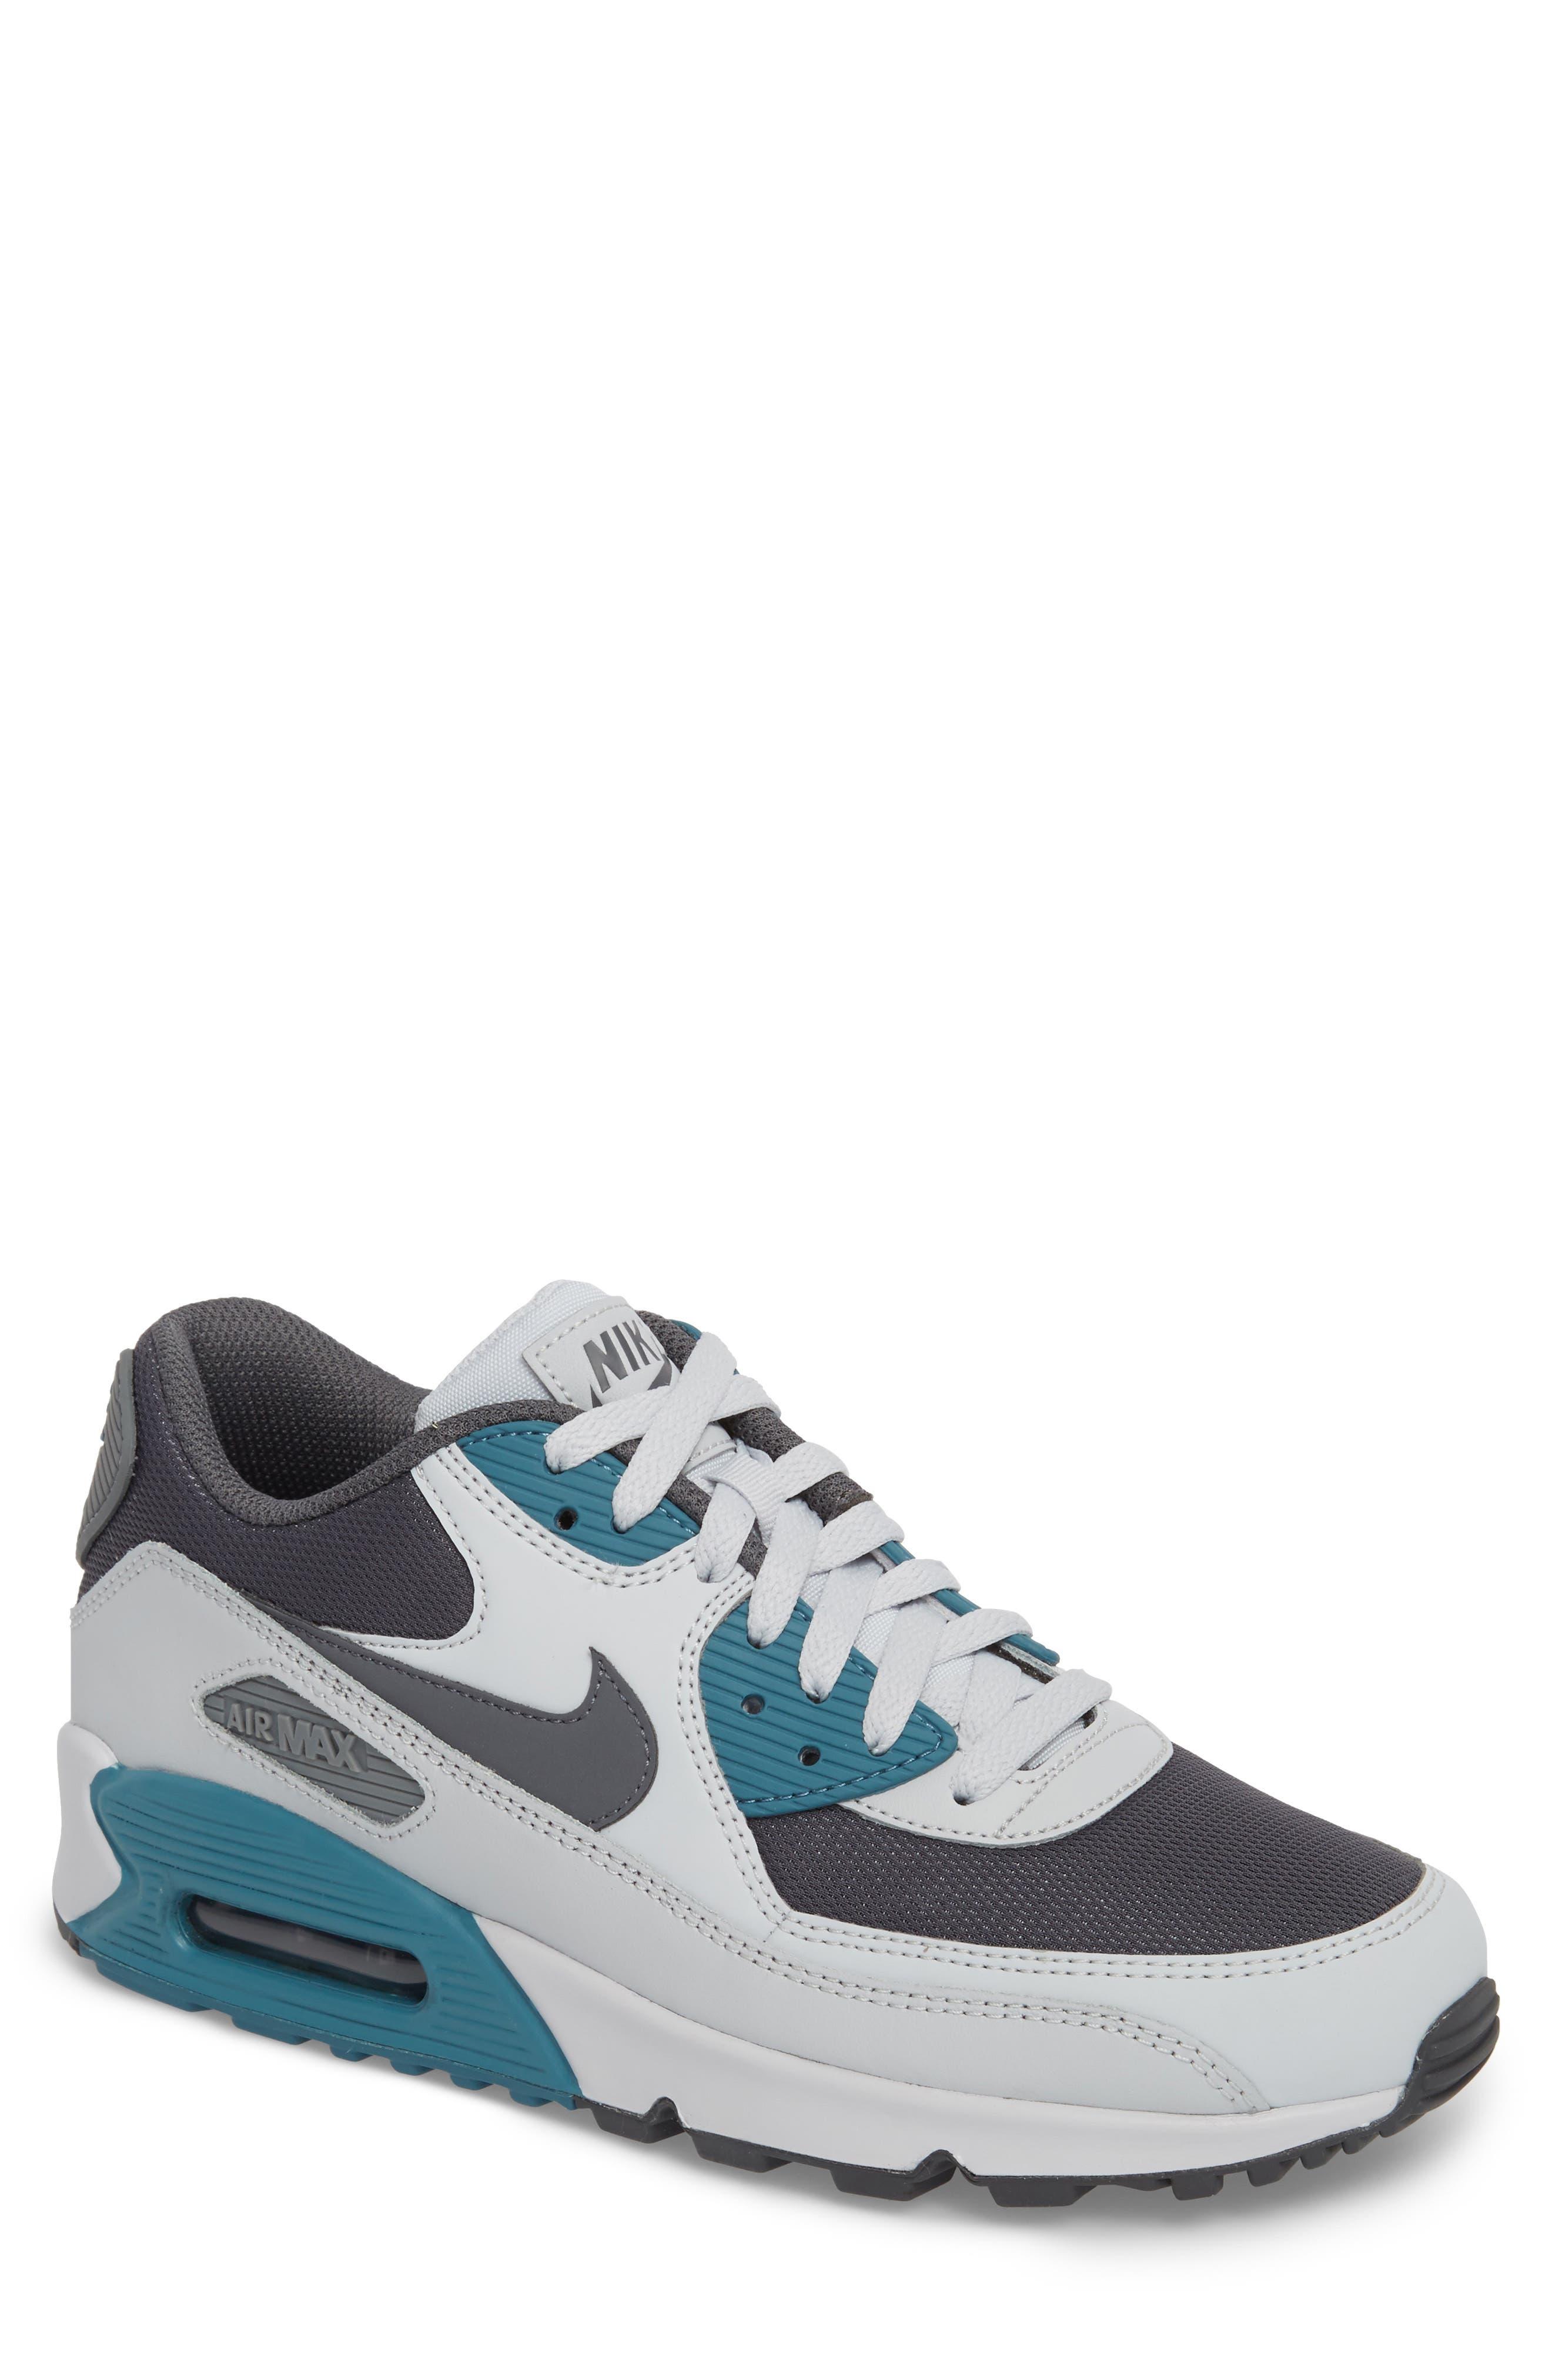 'Air Max 90 Essential' Sneaker,                             Main thumbnail 1, color,                             Pure Platinum/ Cool Grey/ Aqua